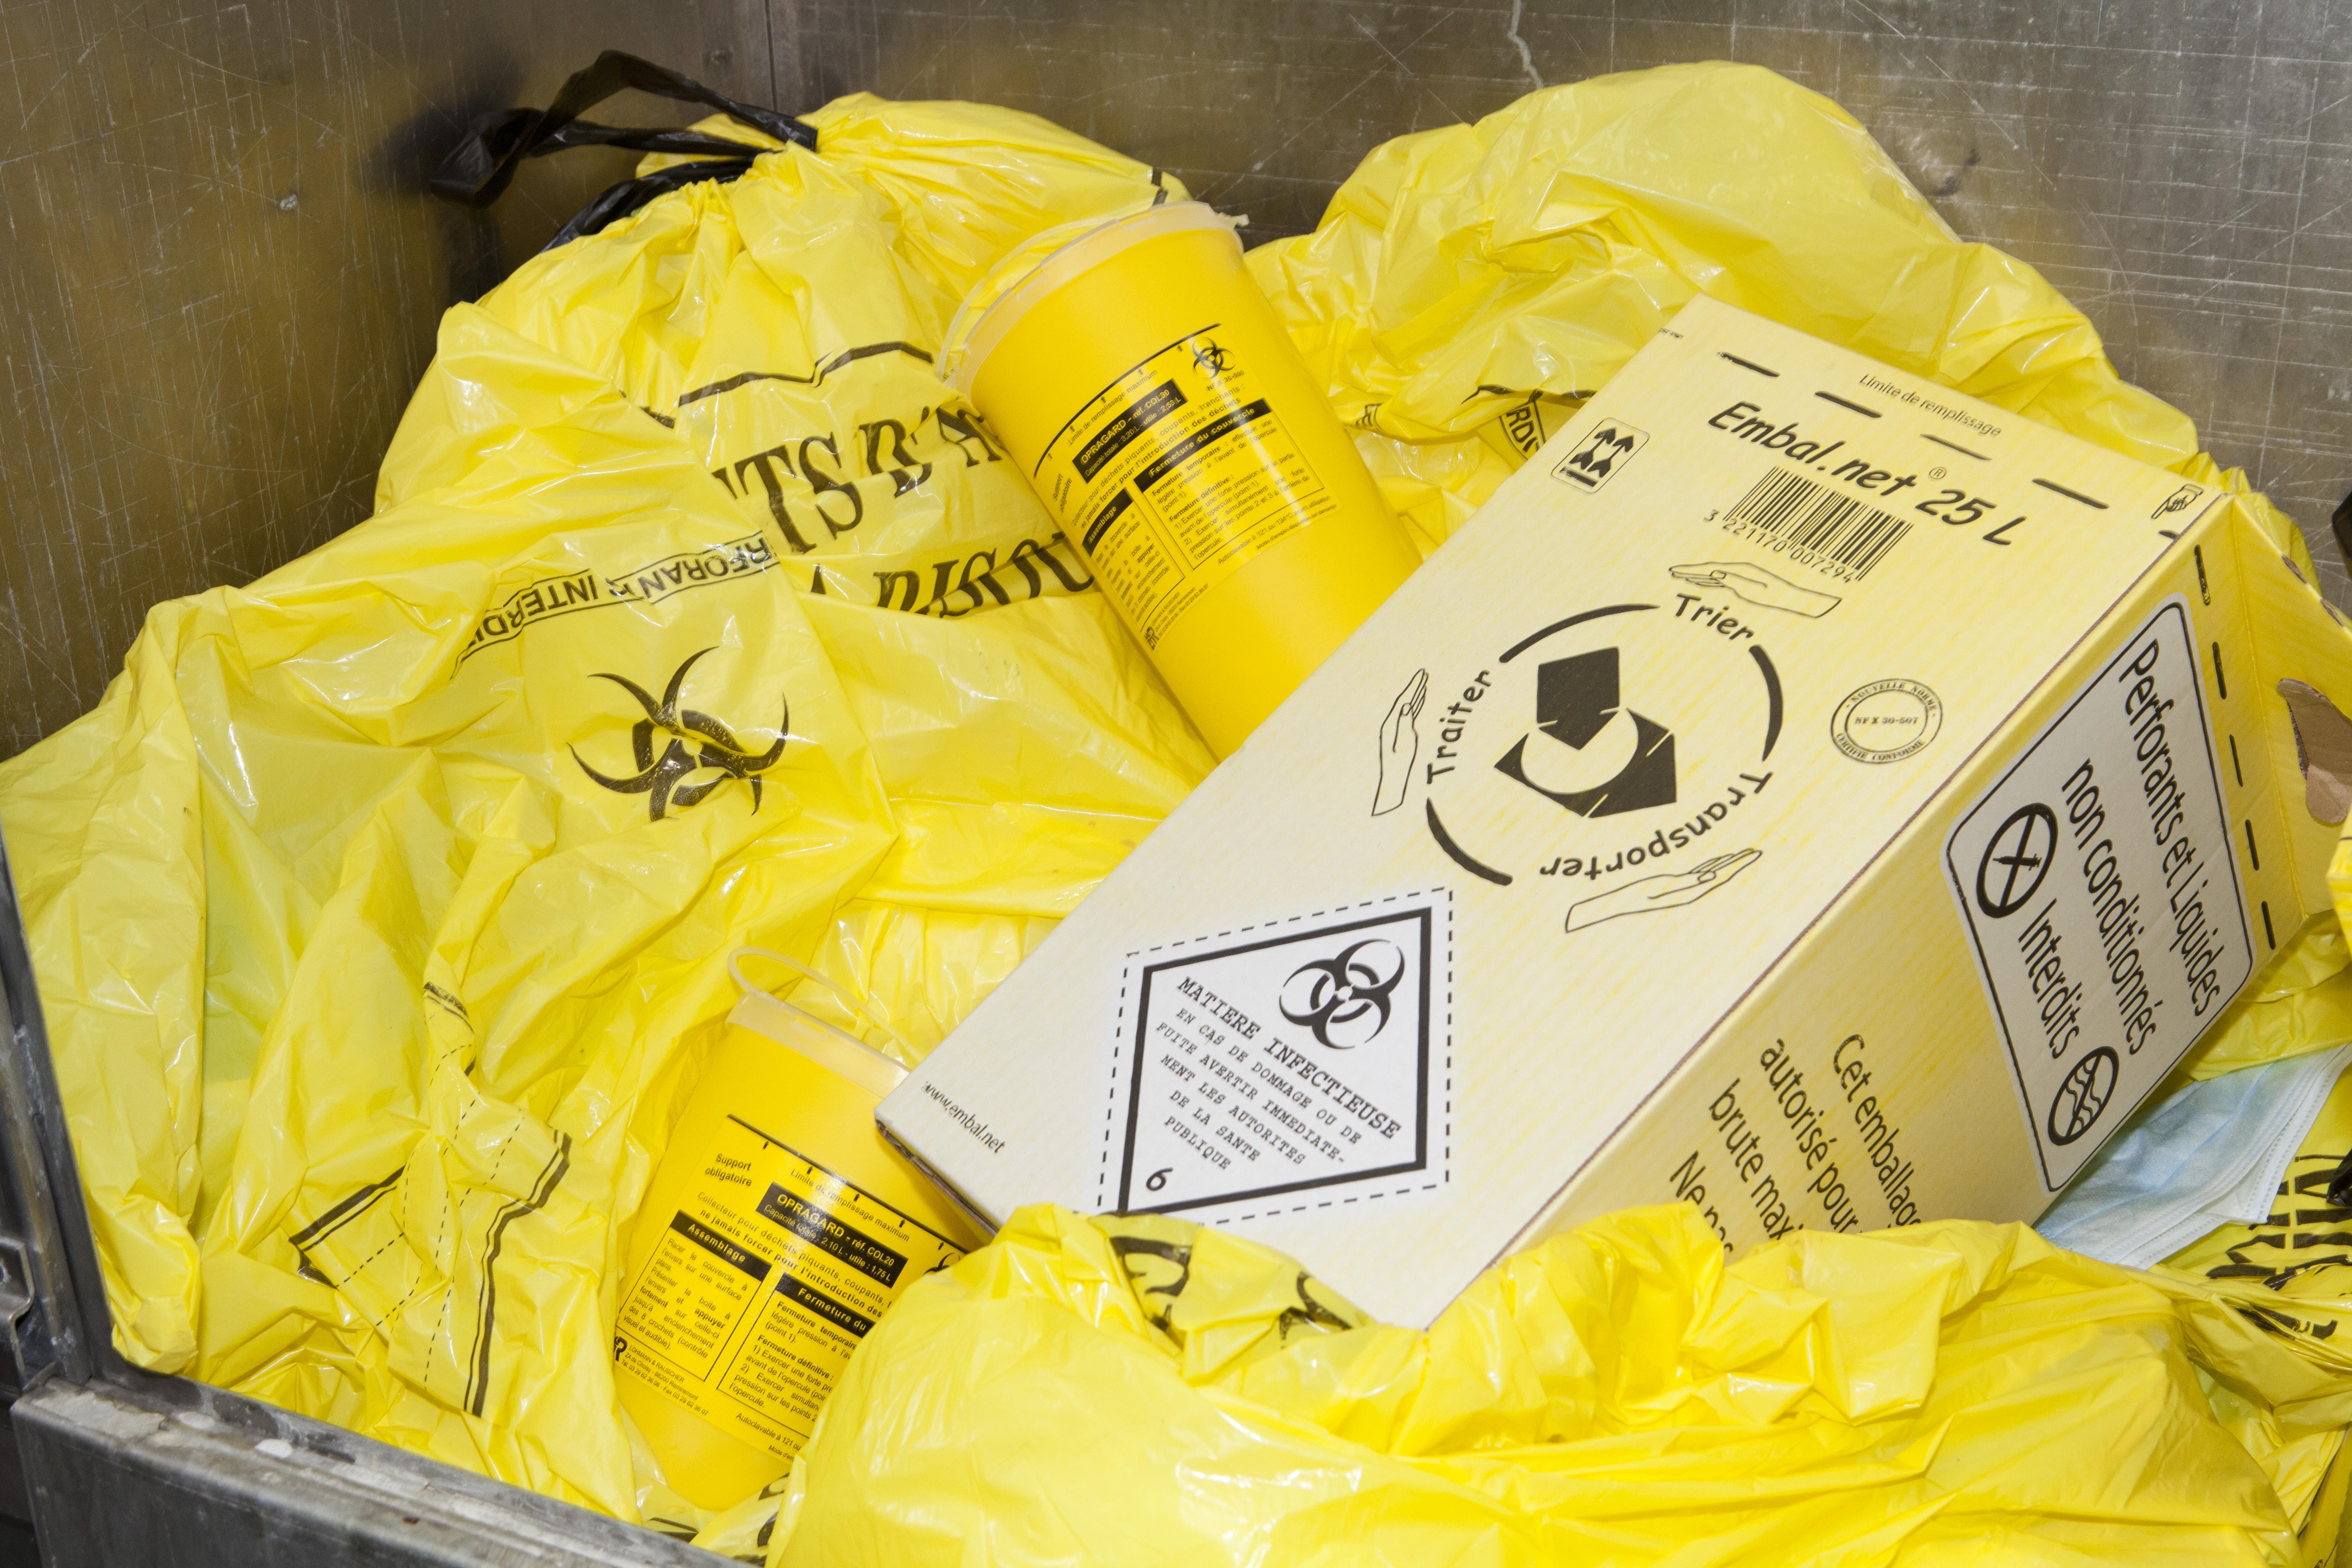 Medical Waste Disposal Equipment Hazardous Medical Waste